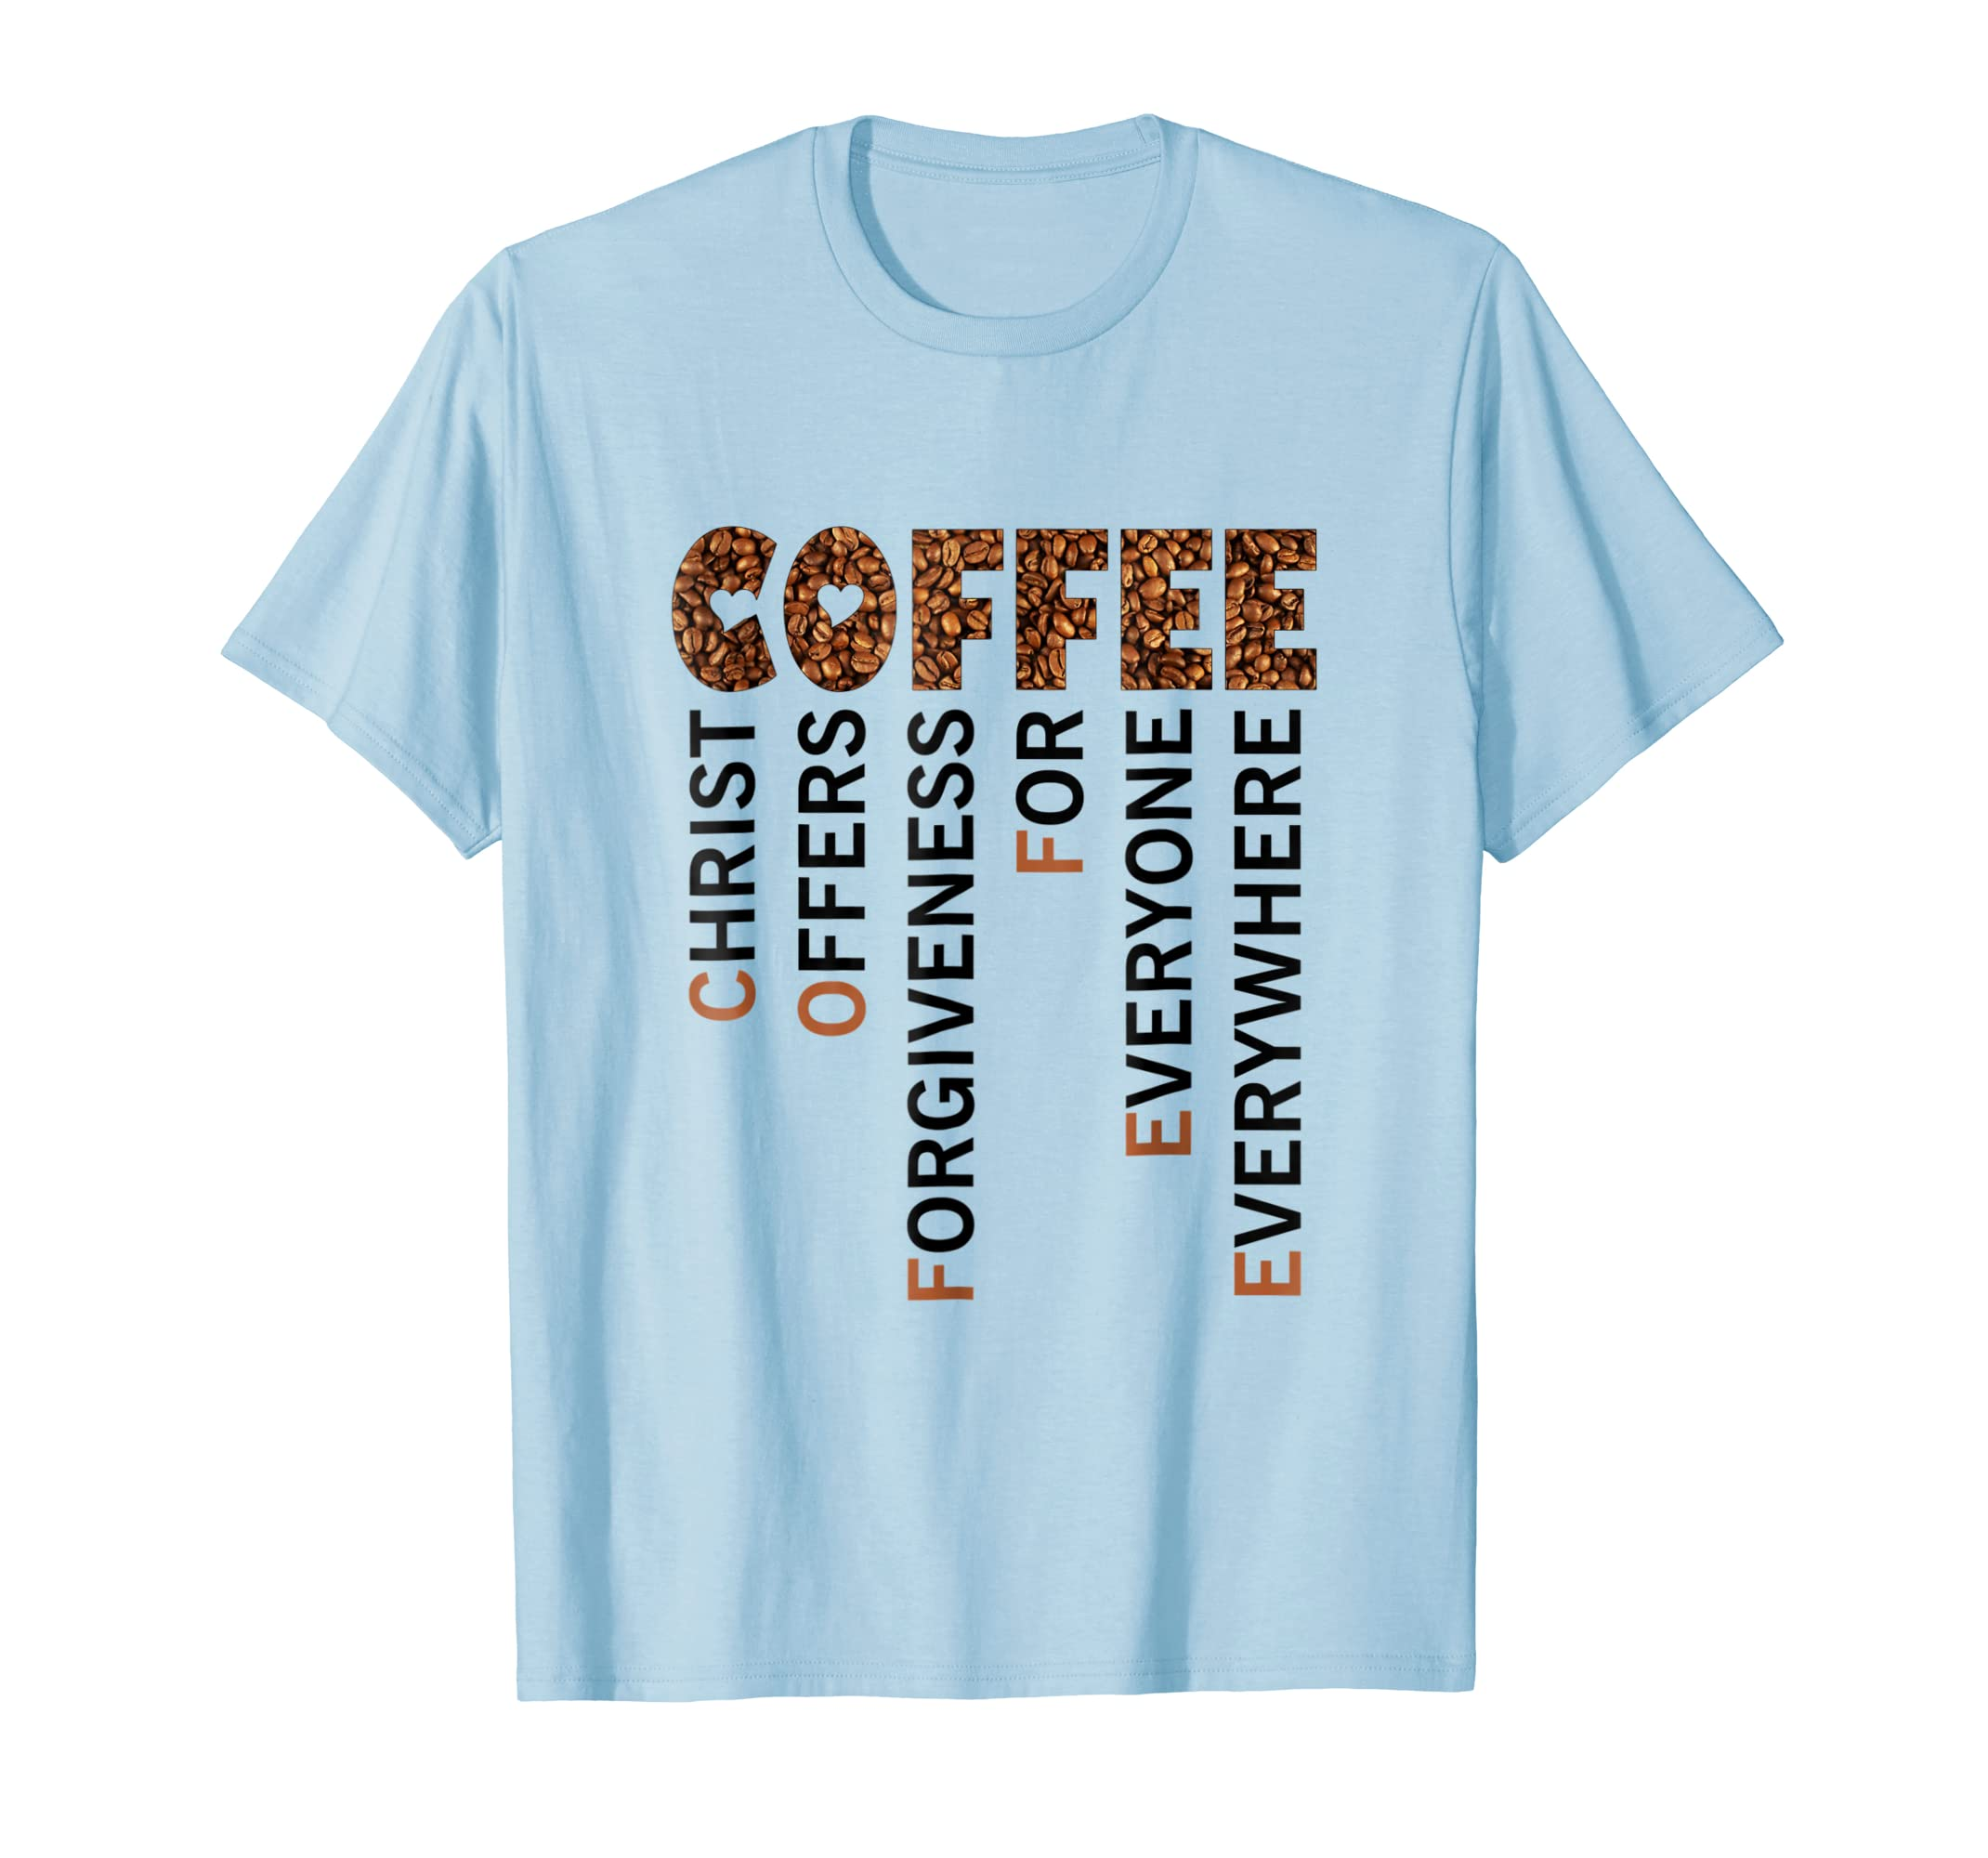 1df3db83 Asat Coffee christ offers forgiveness for everyone T Shirt-azvn ...